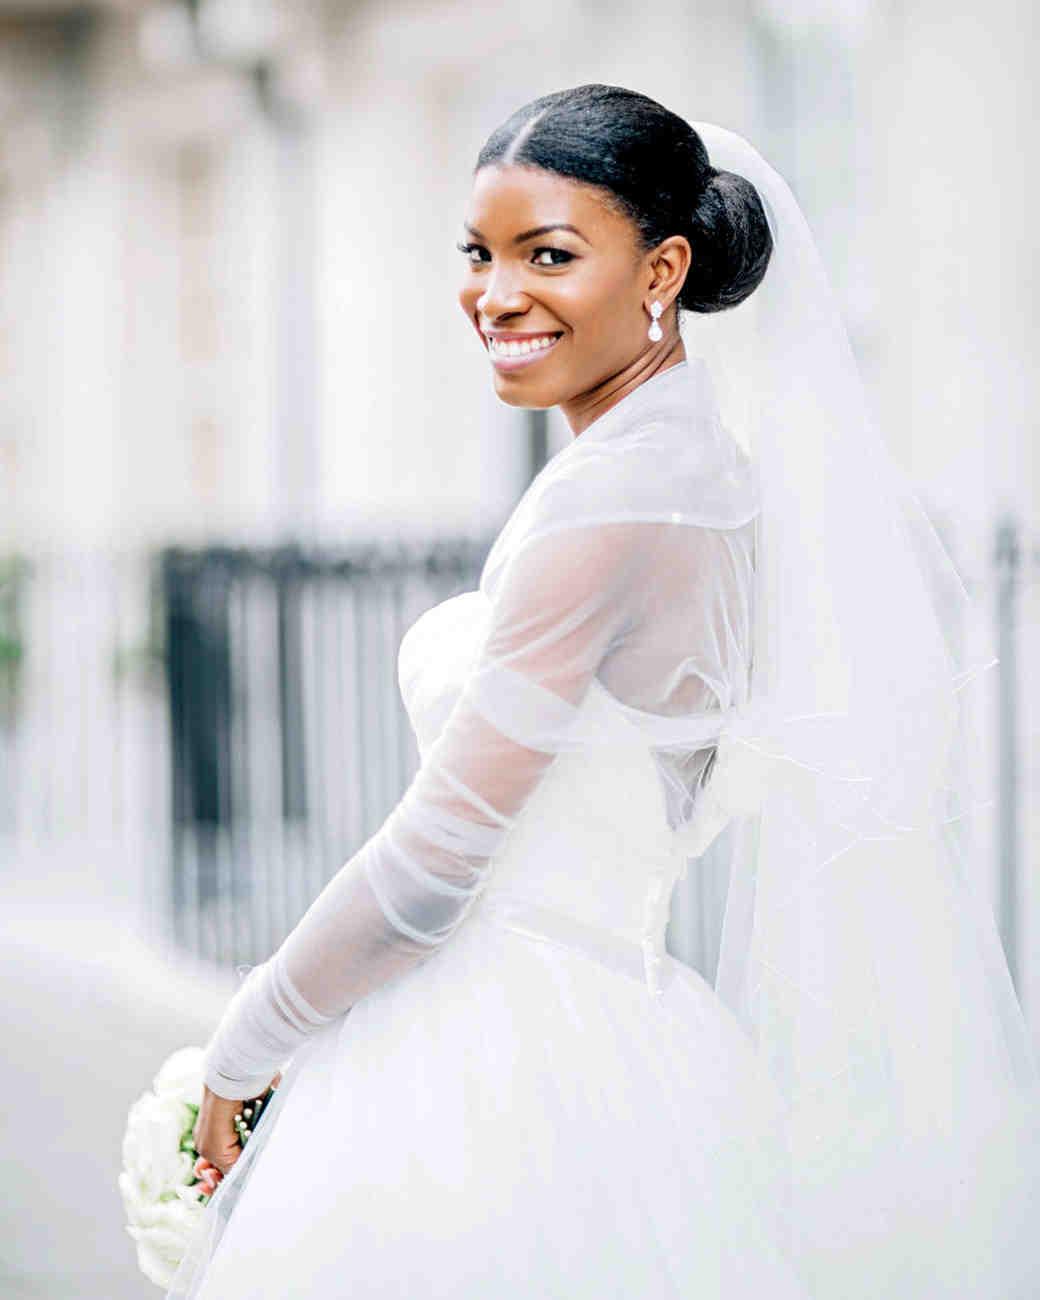 Best Hairstyles for a Wedding Dress Illusion Neckline